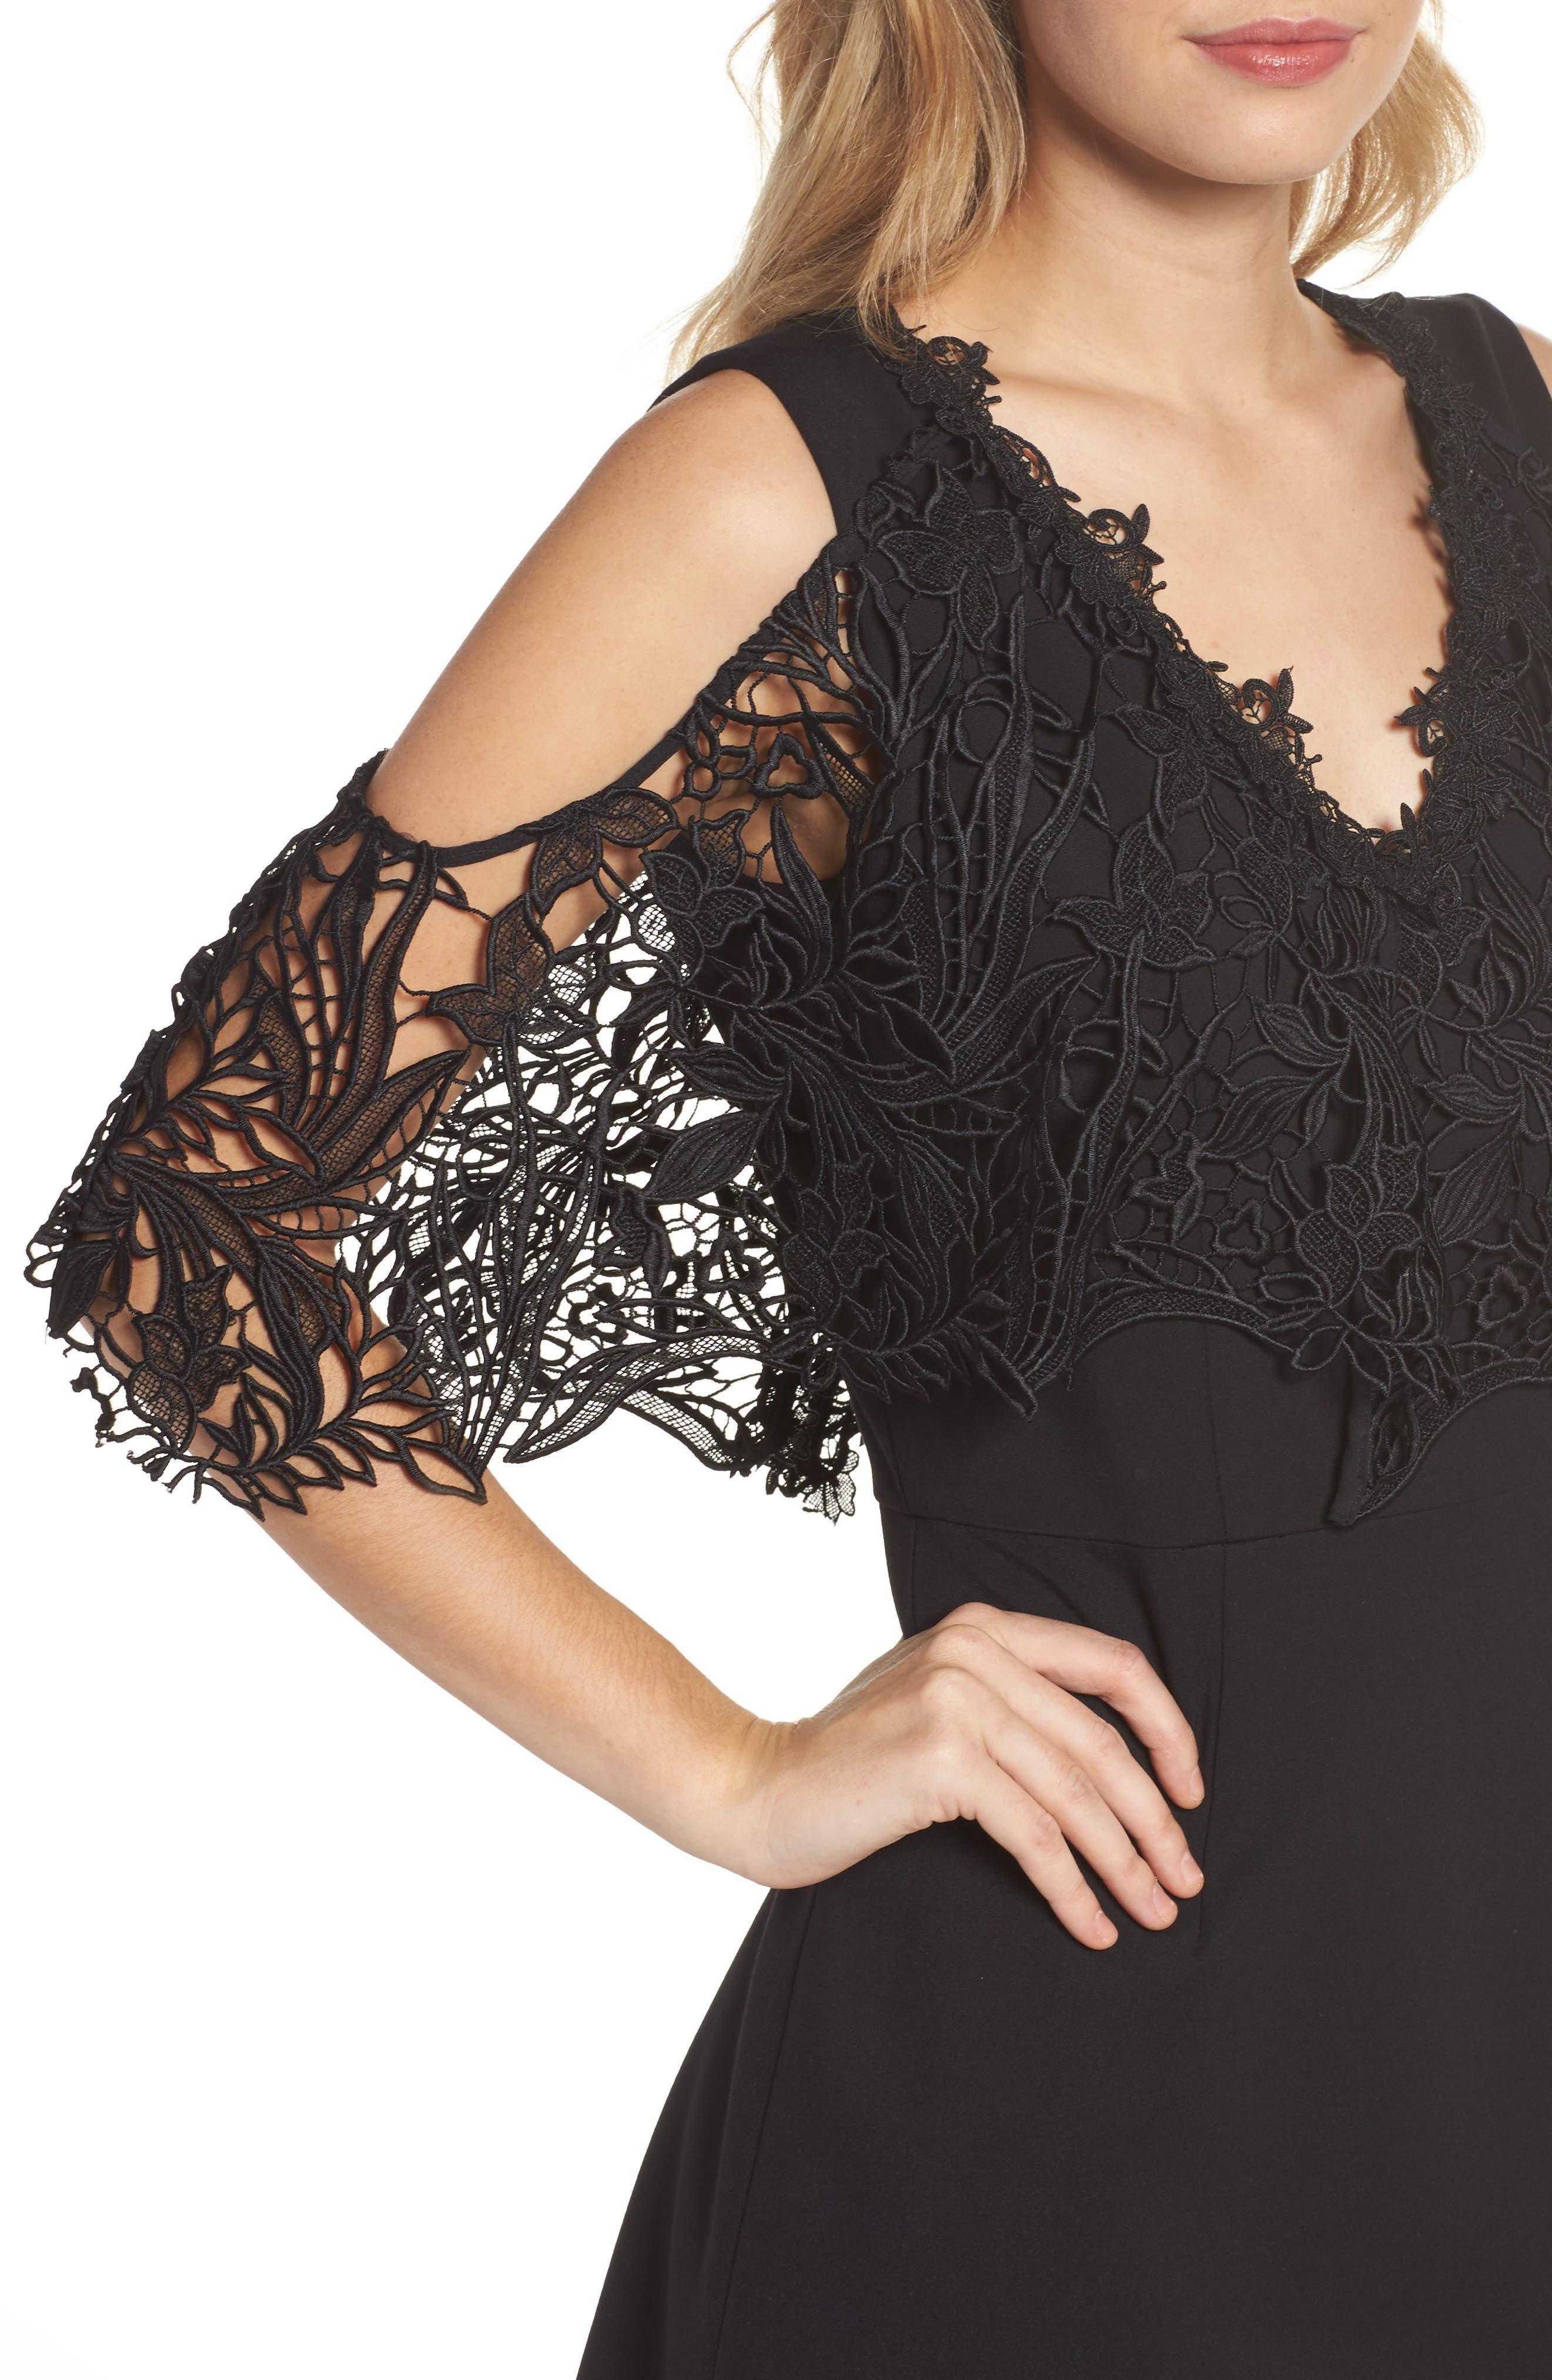 Kena Cold Shoulder Sheath Dress,                             Alternate thumbnail 4, color,                             Black